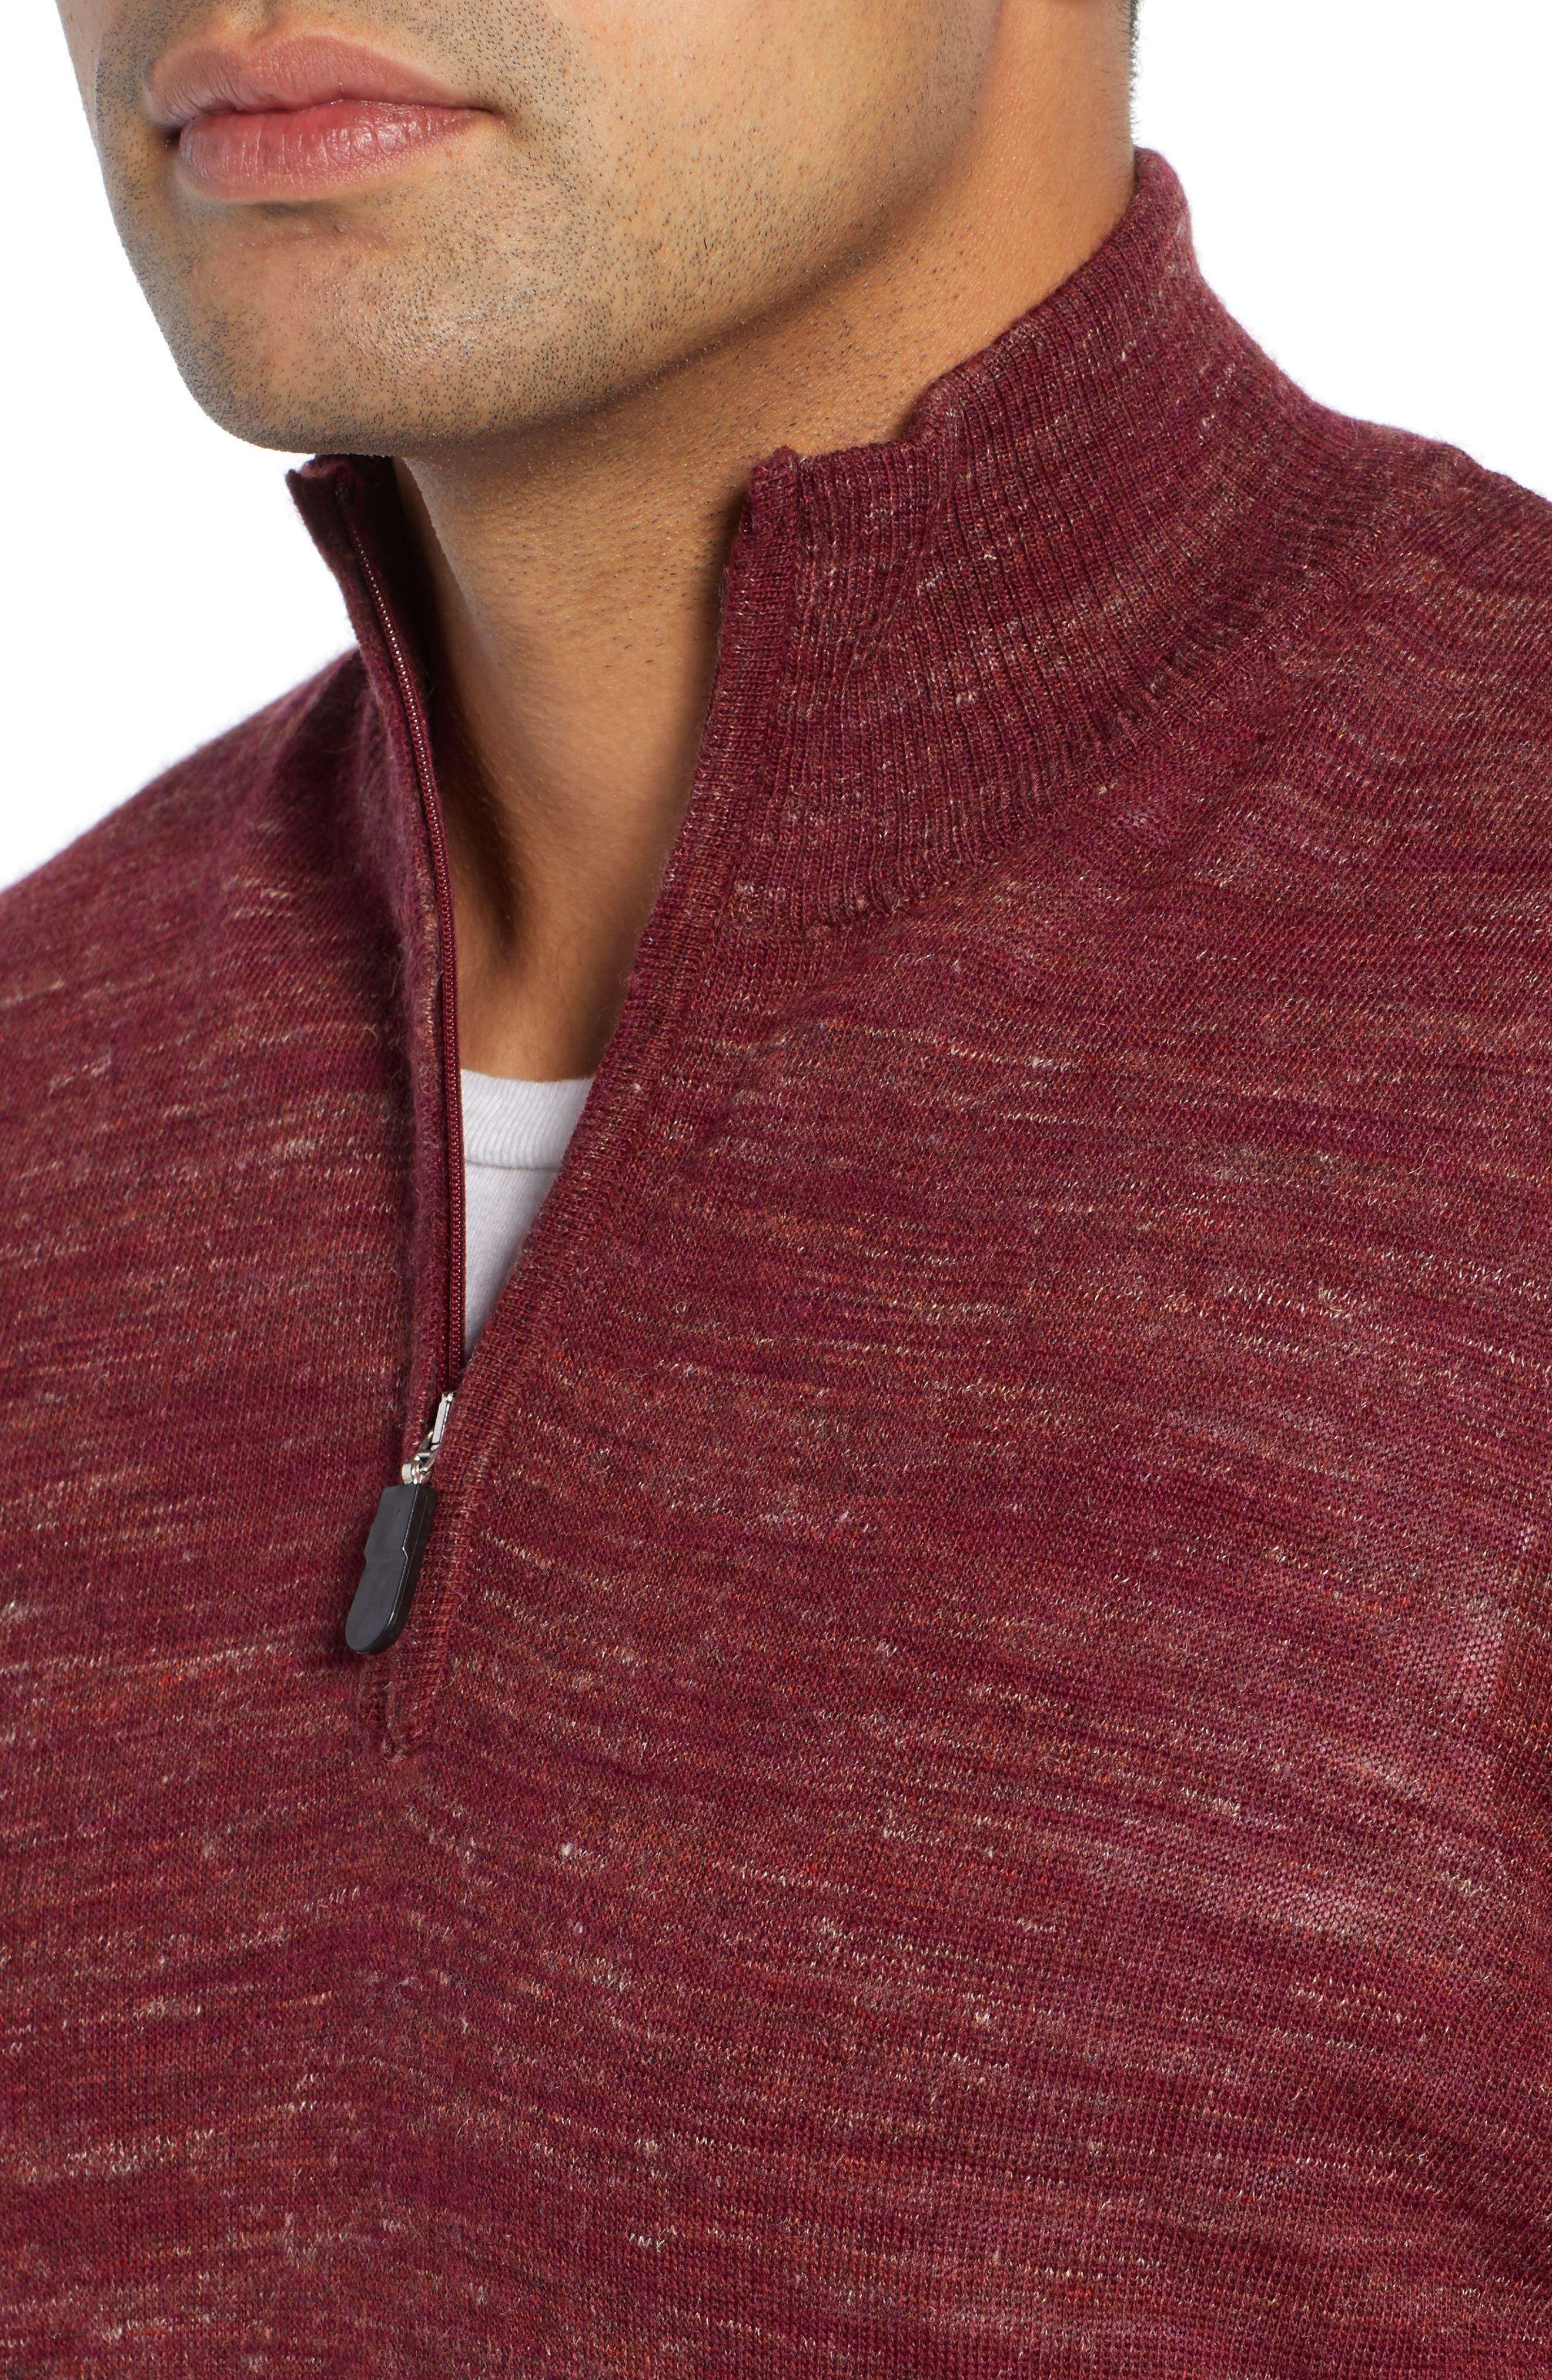 Quarter Zip Pullover,                             Alternate thumbnail 4, color,                             WINE